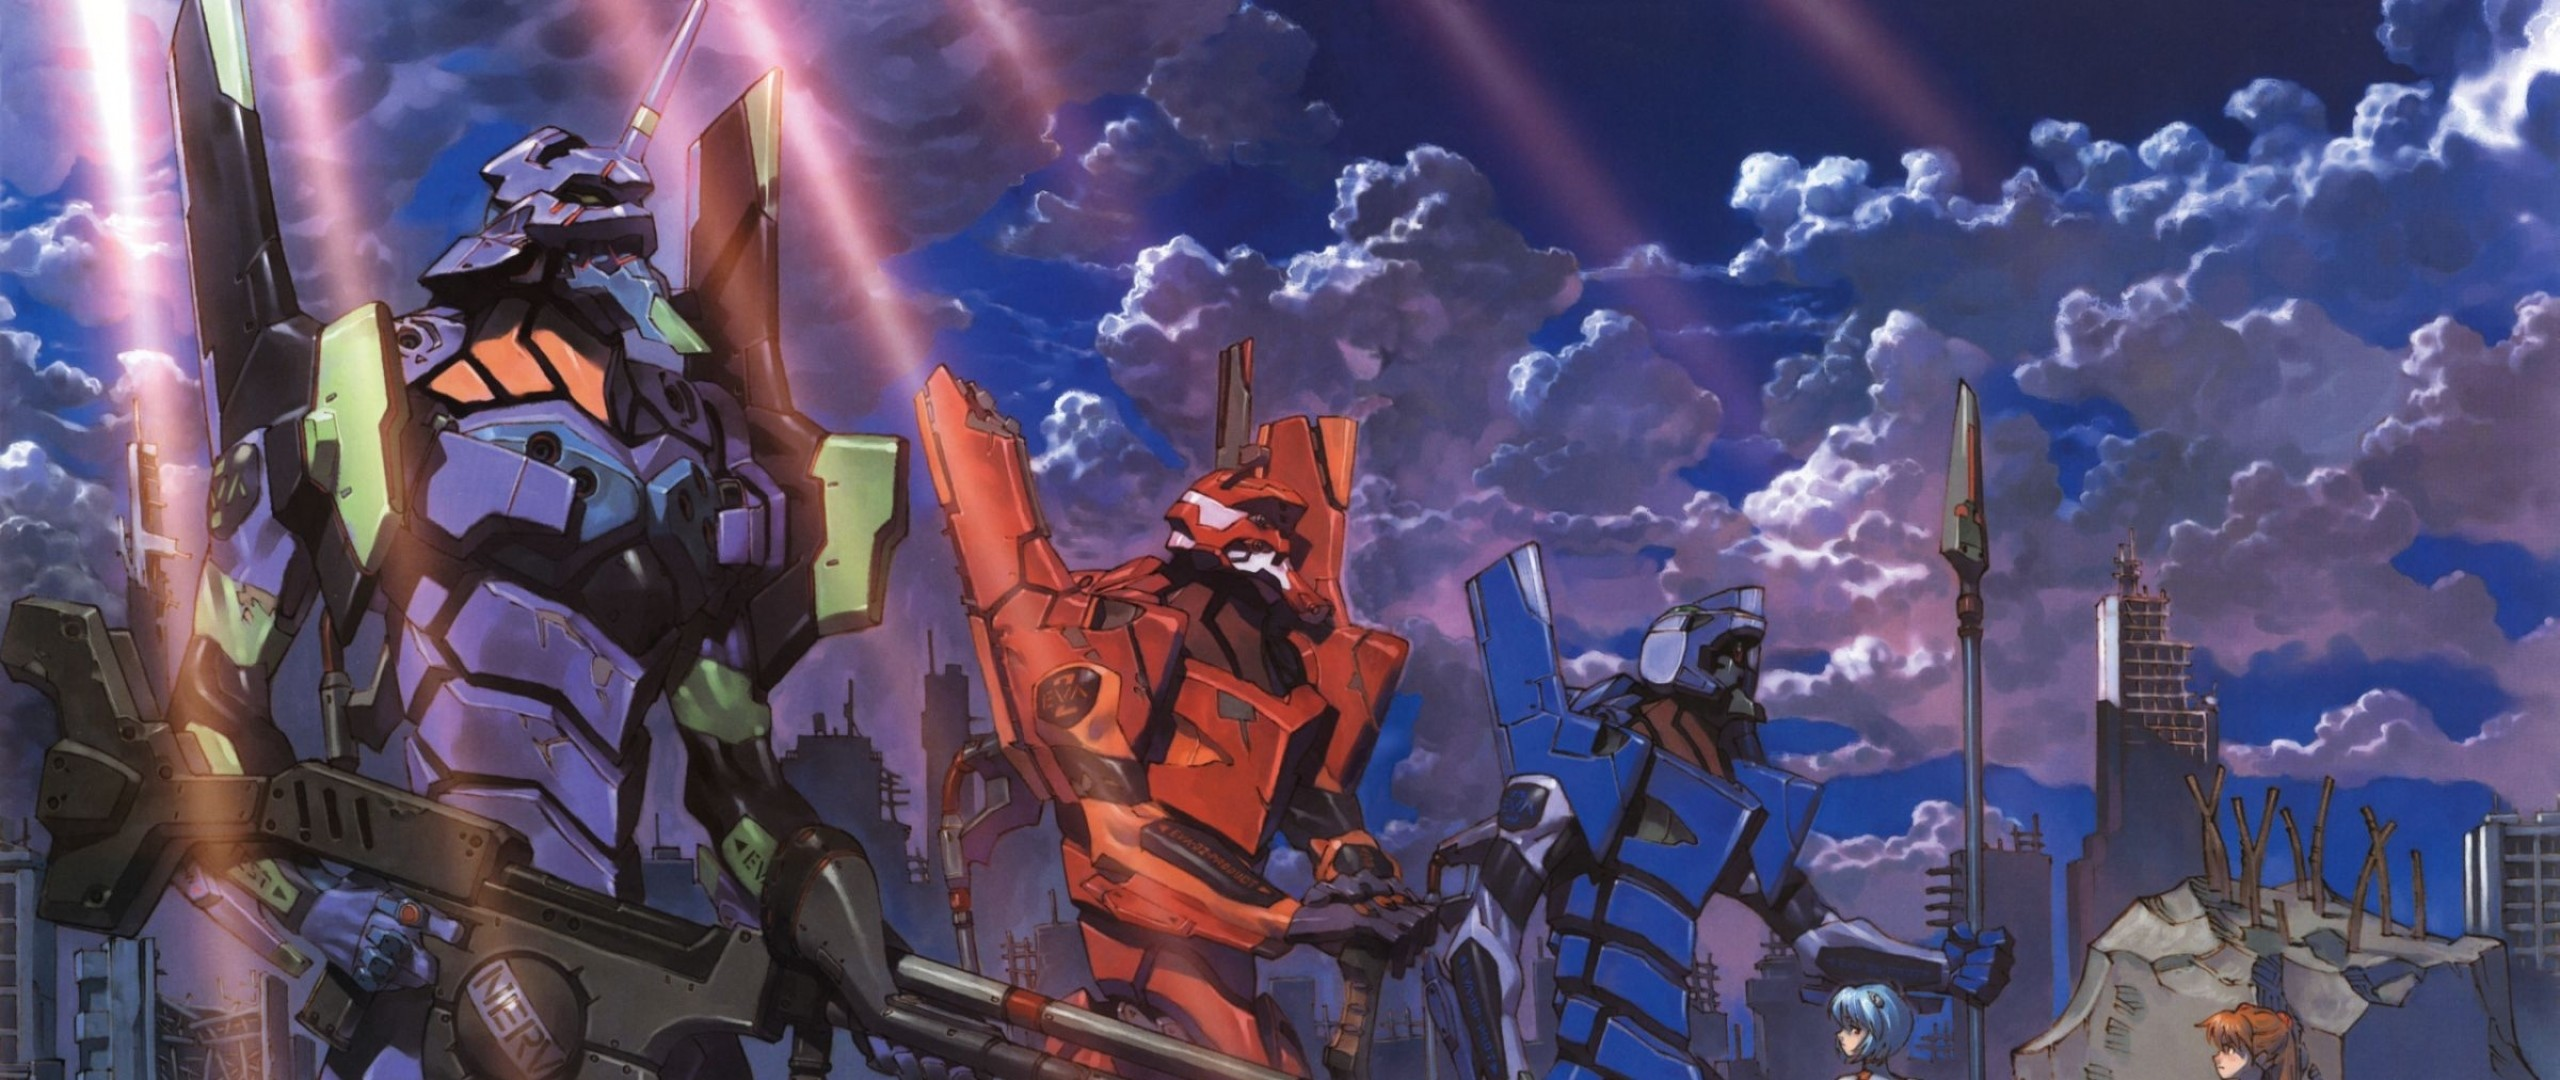 Preview wallpaper eva, robots, anime, evangelion 2560×1080